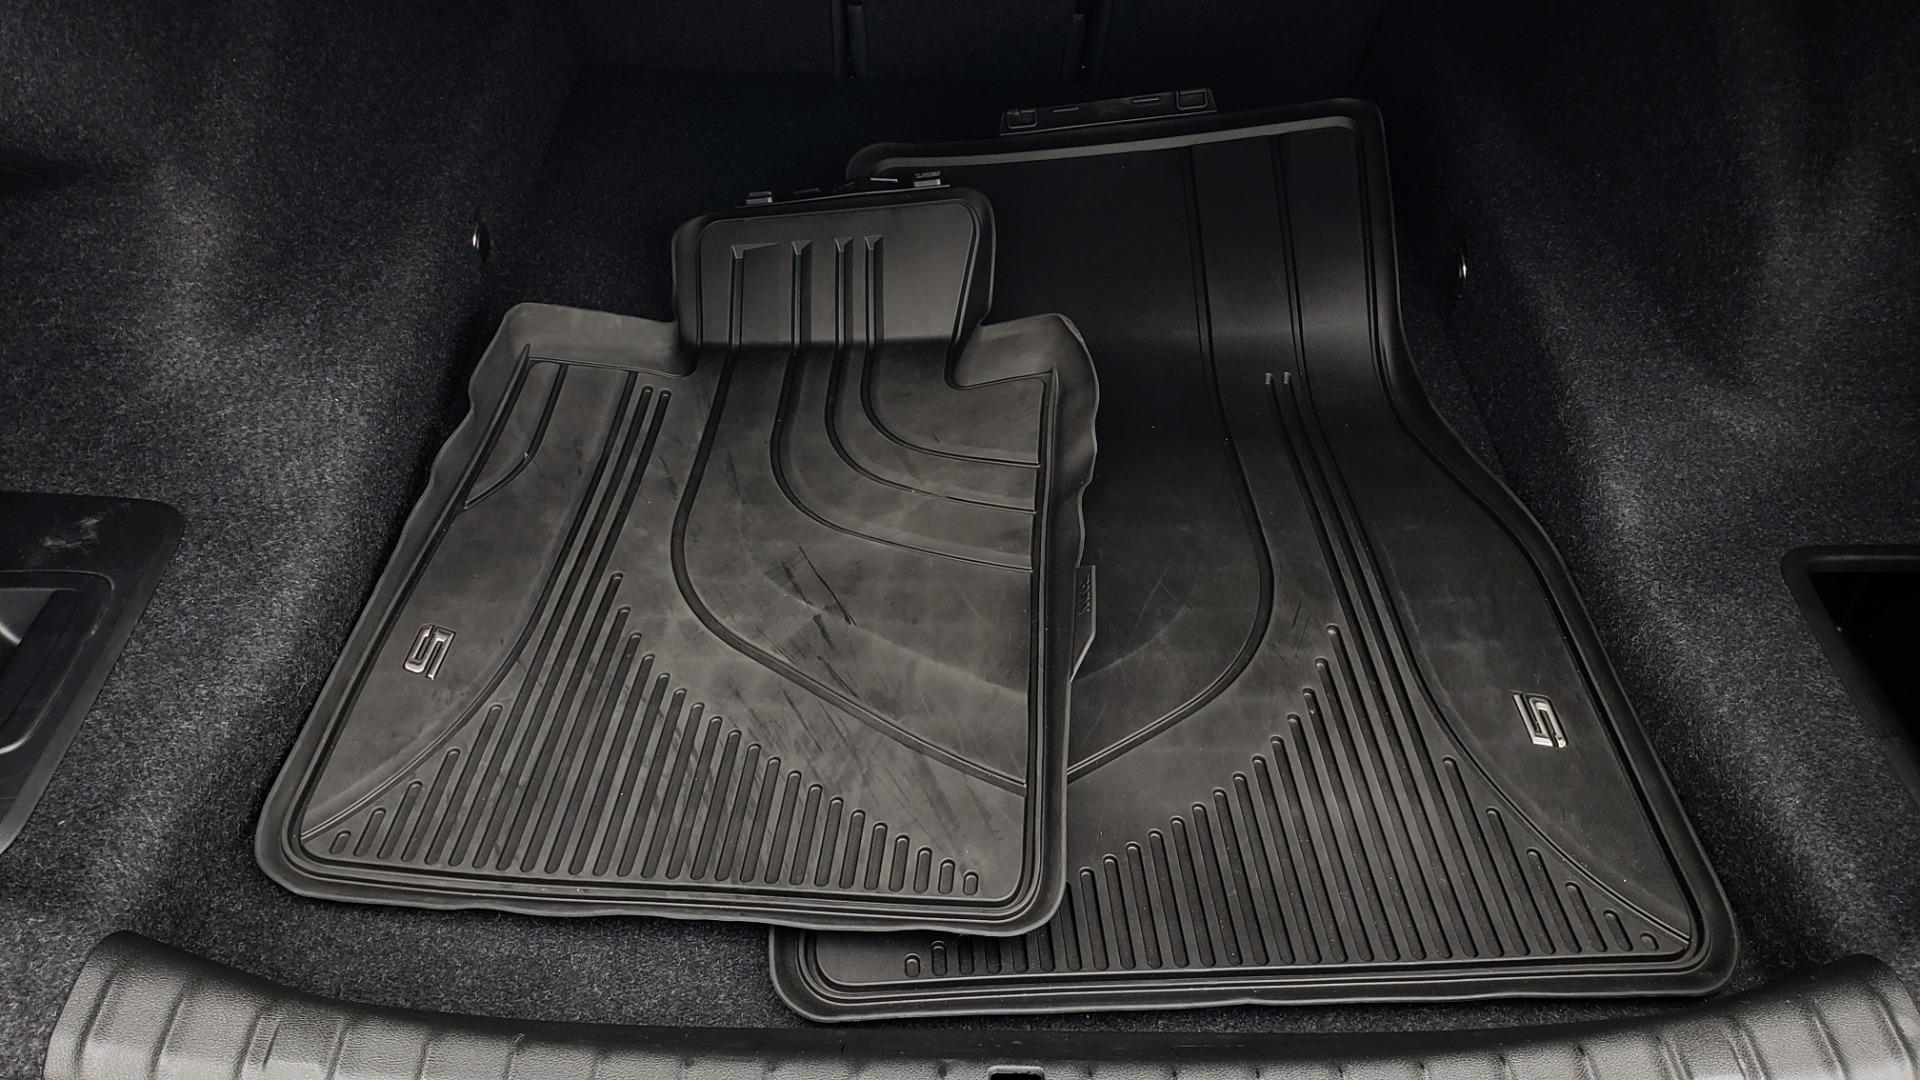 Used 2017 BMW 5 SERIES 530IXDRIVE / PREM PKG / DRVR ASST PLUS / CLD WTHR / APPLE CARPLAY for sale Sold at Formula Imports in Charlotte NC 28227 16